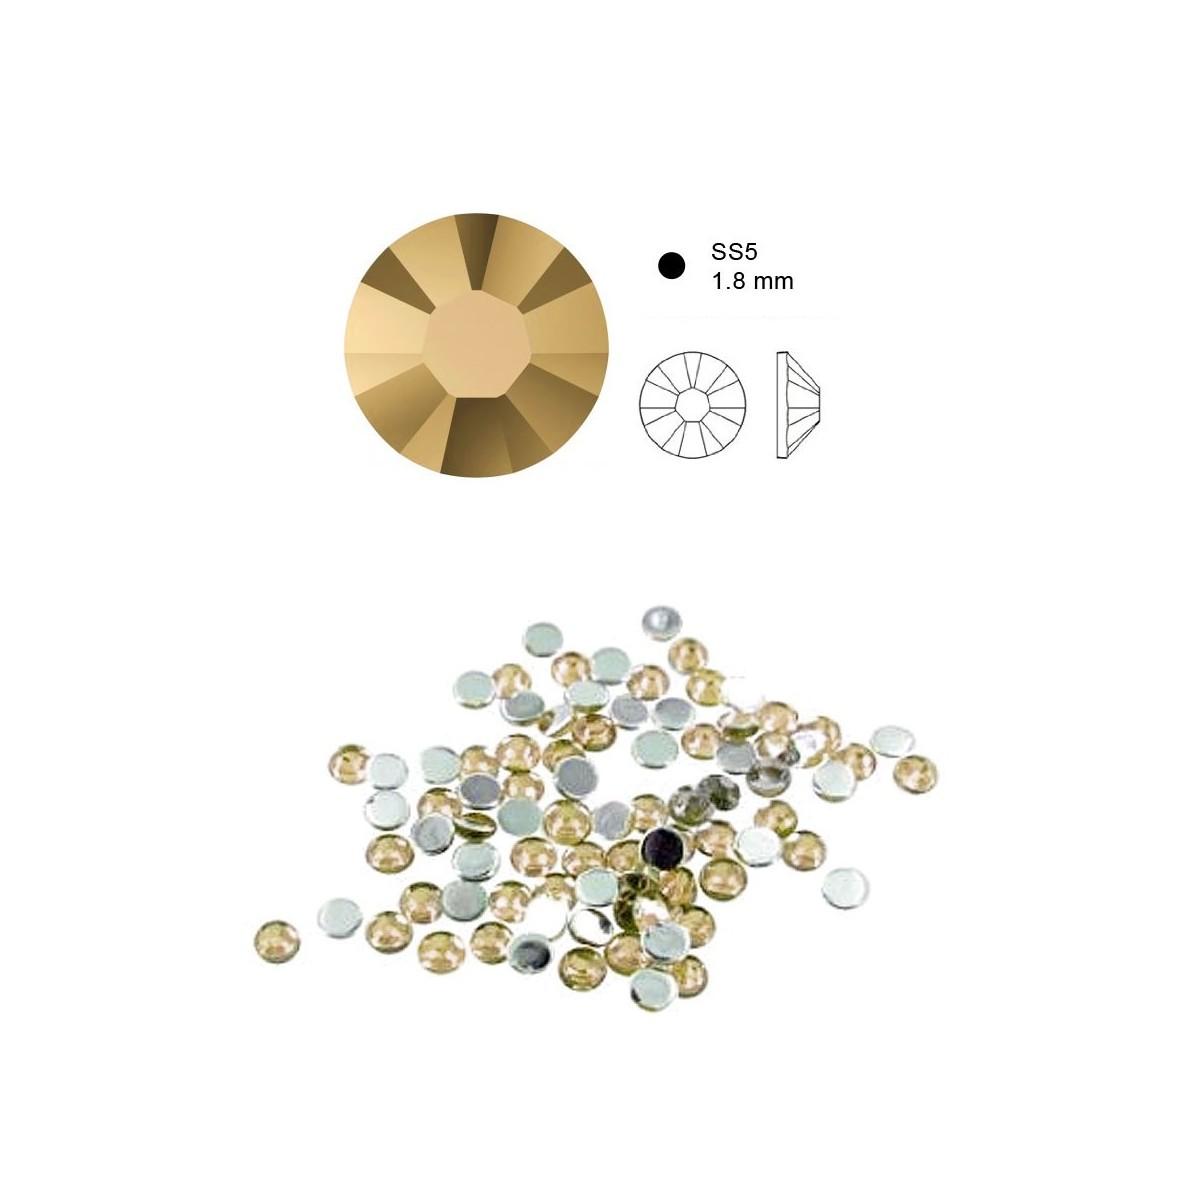 50 Cristaux de SWAROVSKI metalic light gold à fond plat